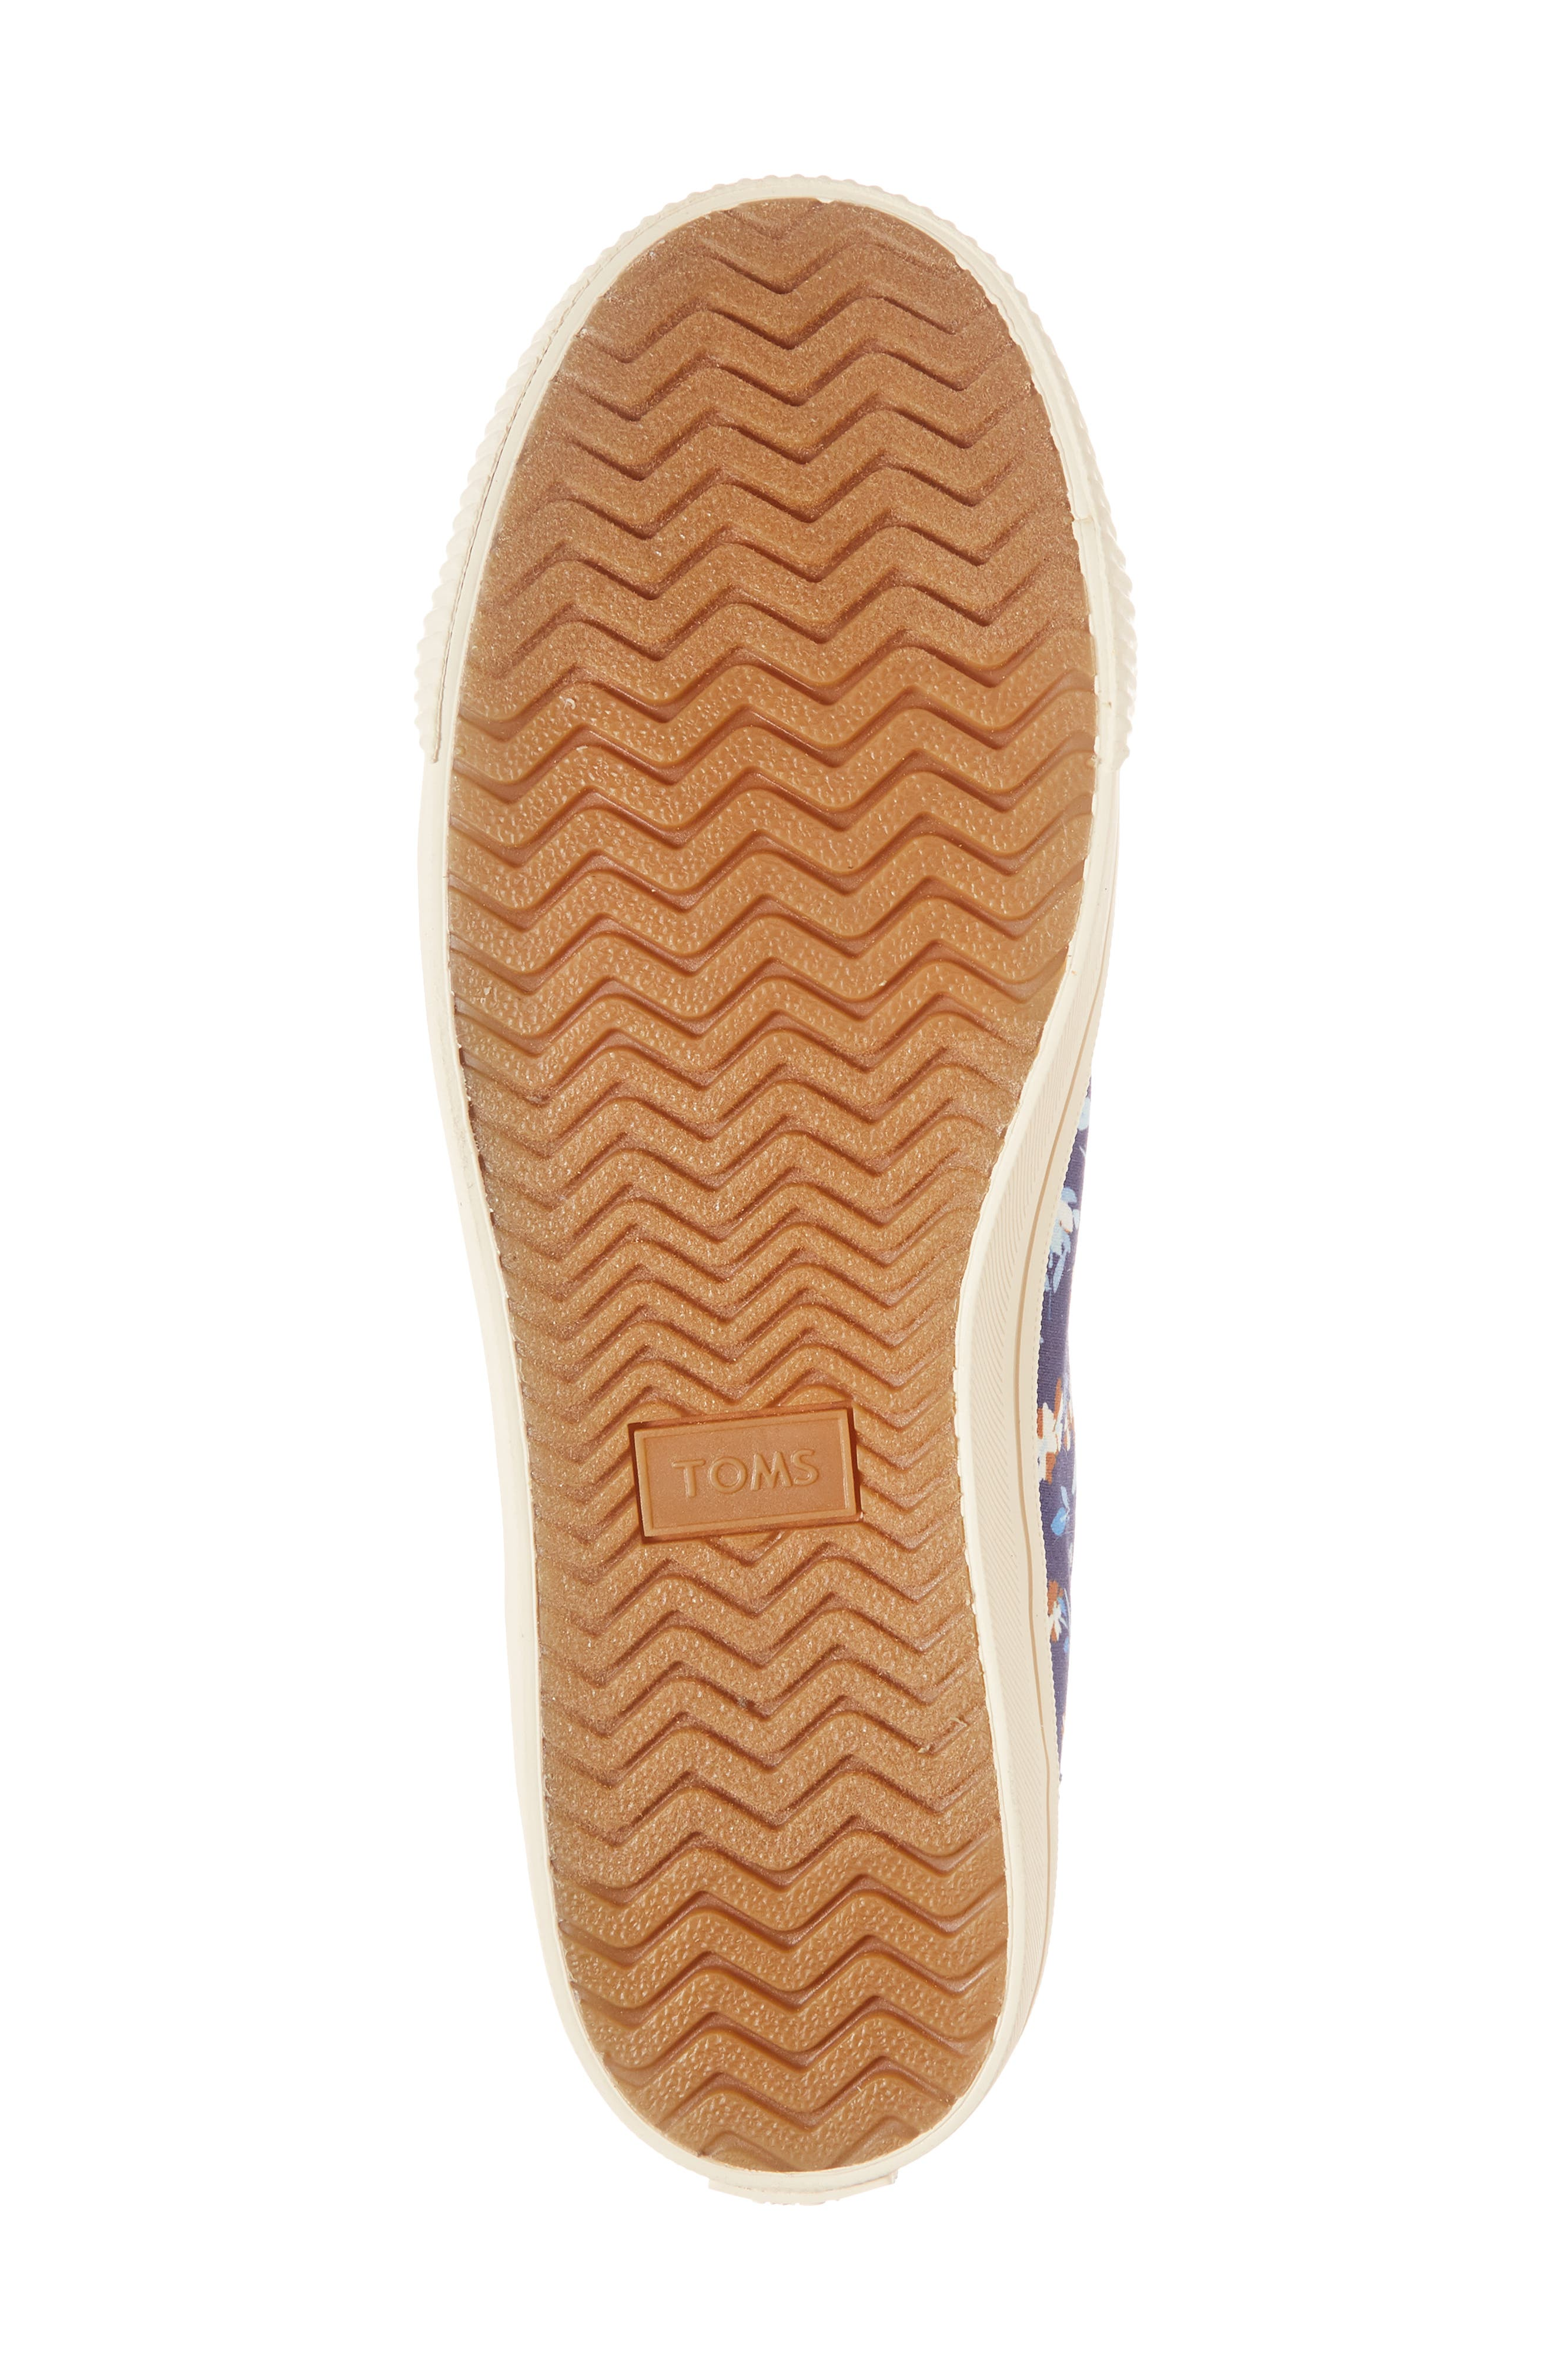 Camarillo High Top Sneaker,                             Alternate thumbnail 6, color,                             Deep Blue Vintage Flower